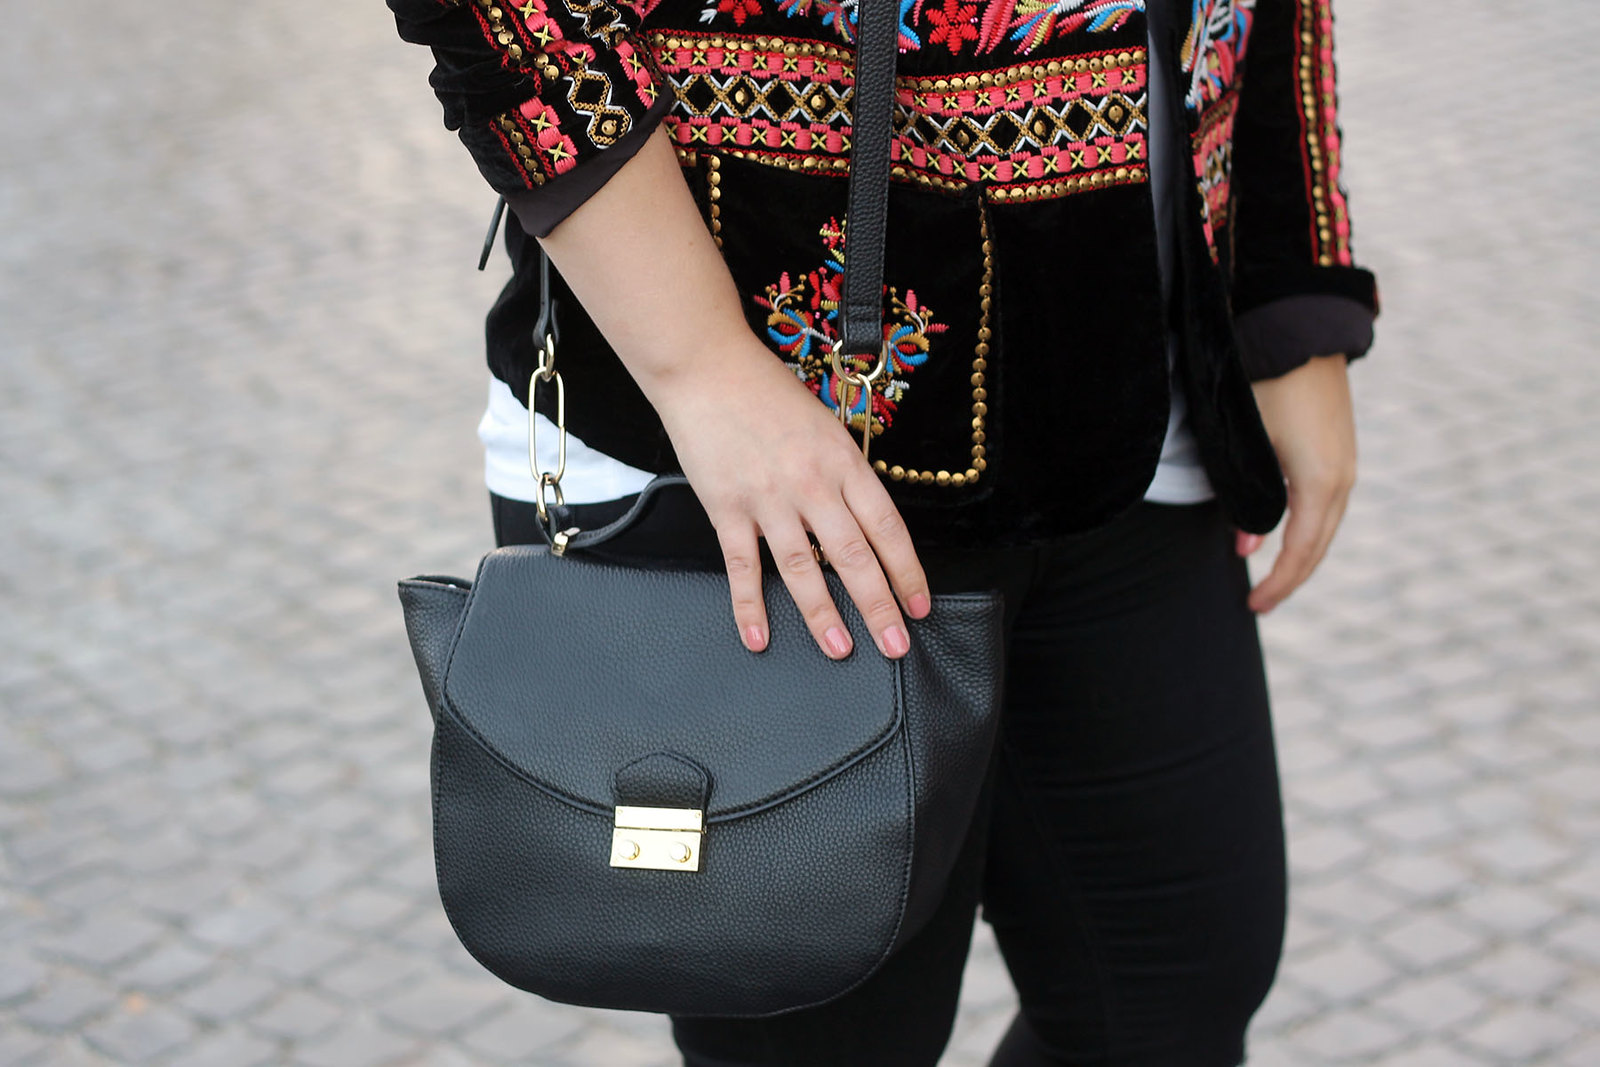 tasche-chloe-drew-lookalike-trend-schwarz-modeblog